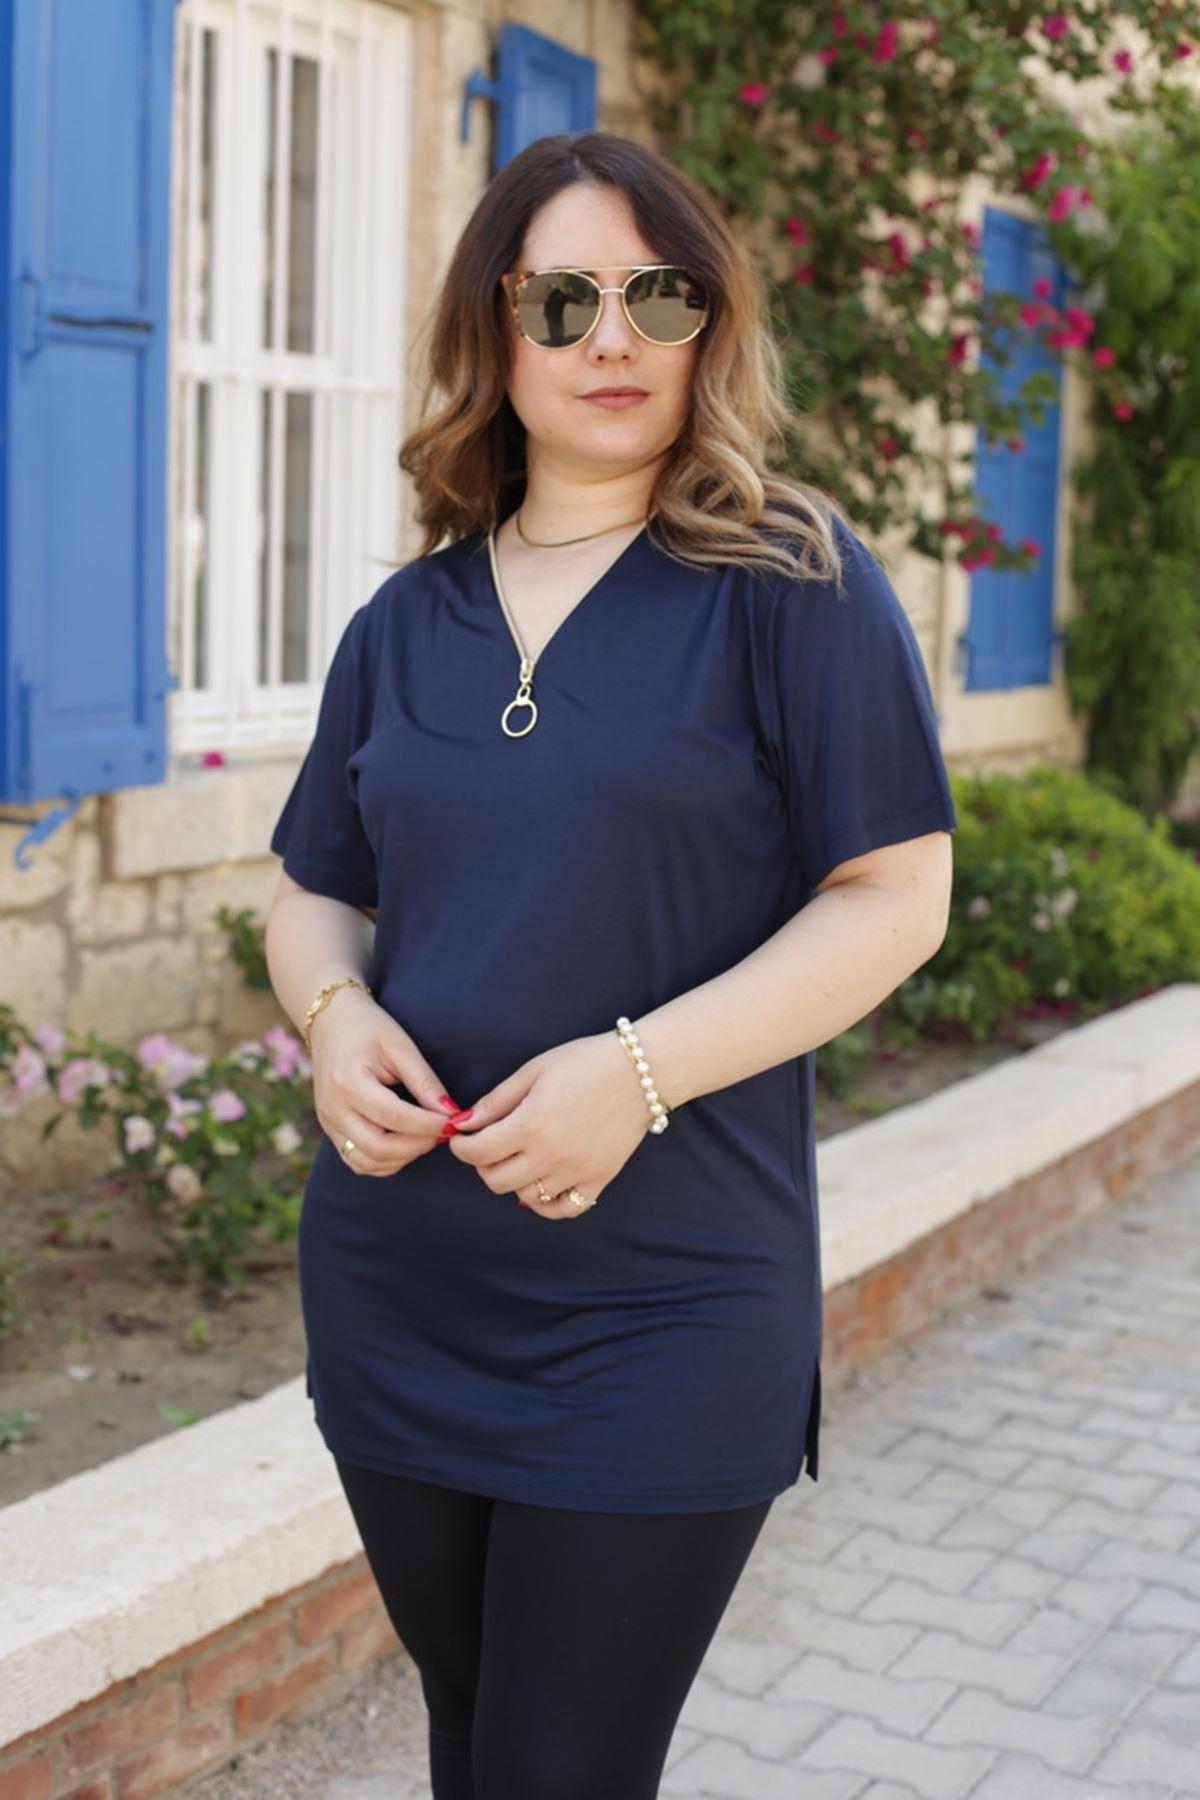 RENKTE GENİŞ KESİM FERMUARLI KOYU LACİVERT T-SHİRT